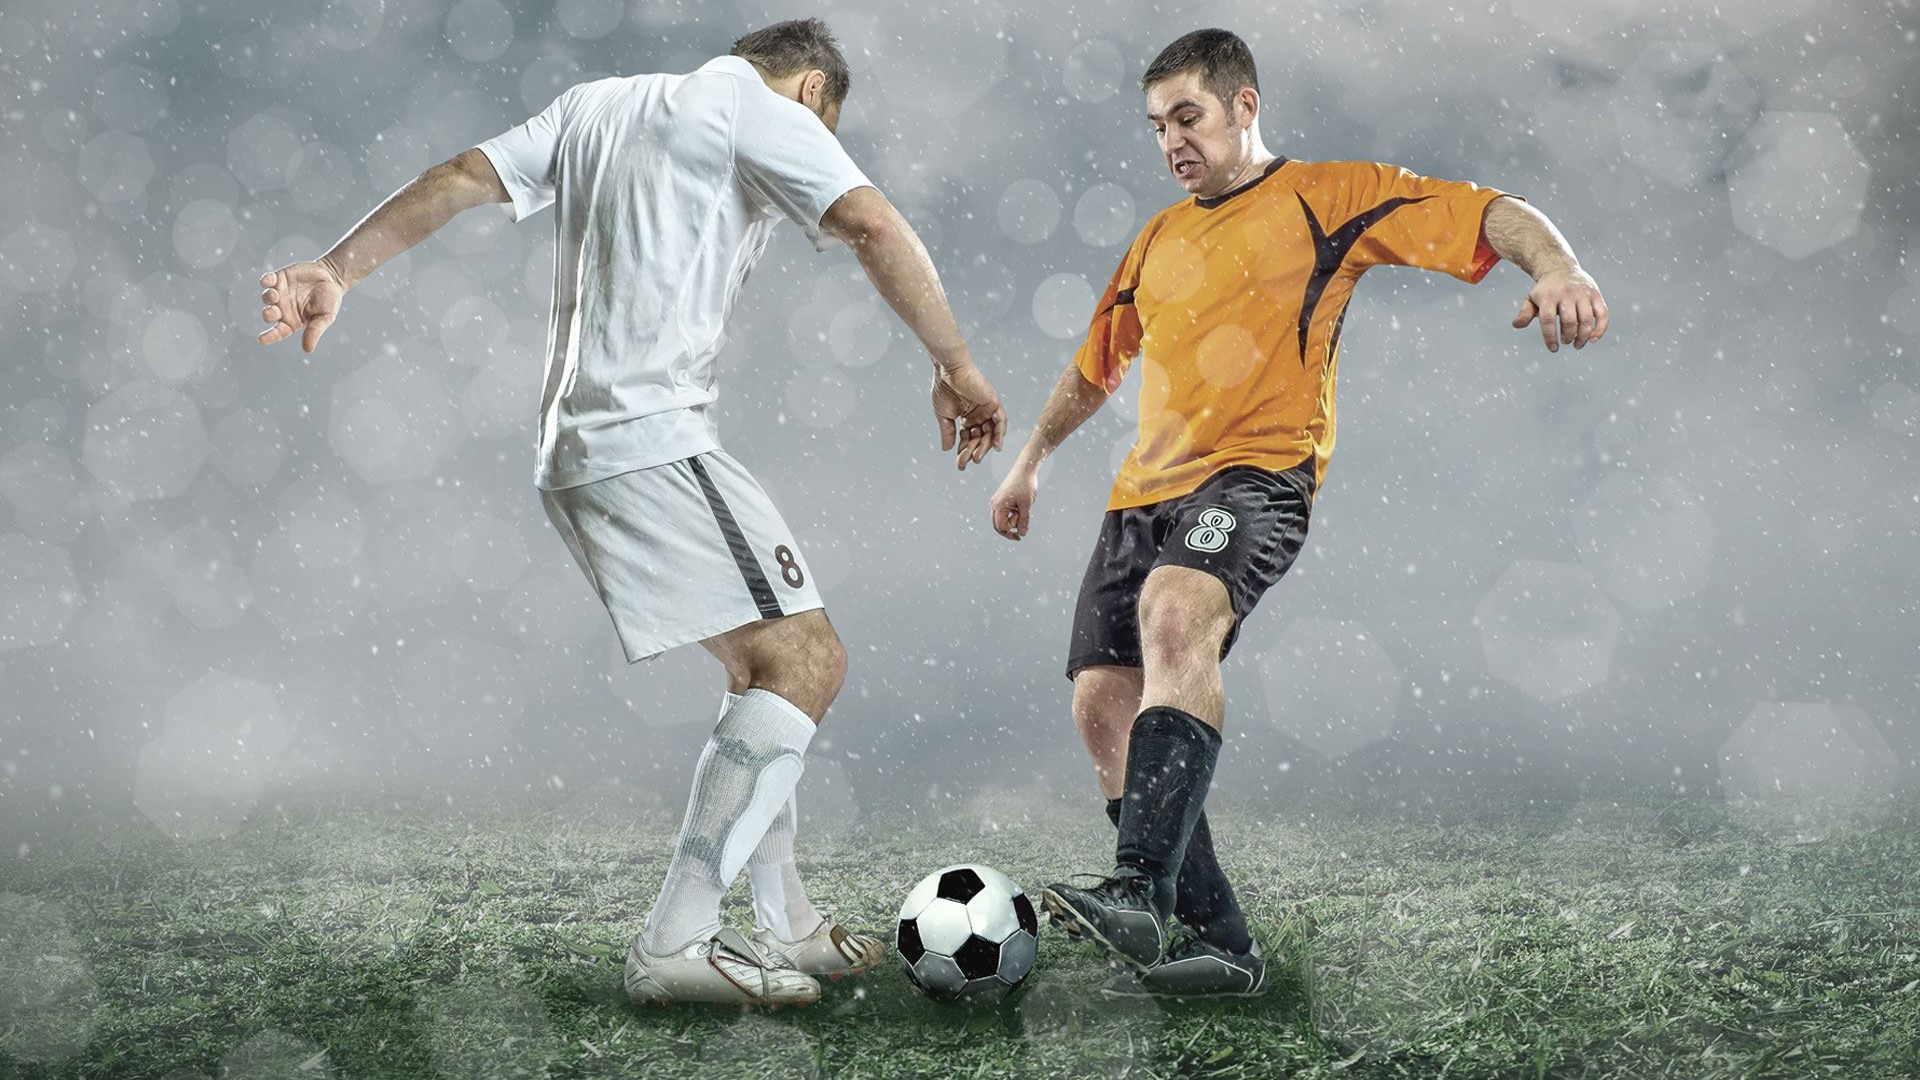 chile-vs-kenya-rugby-live